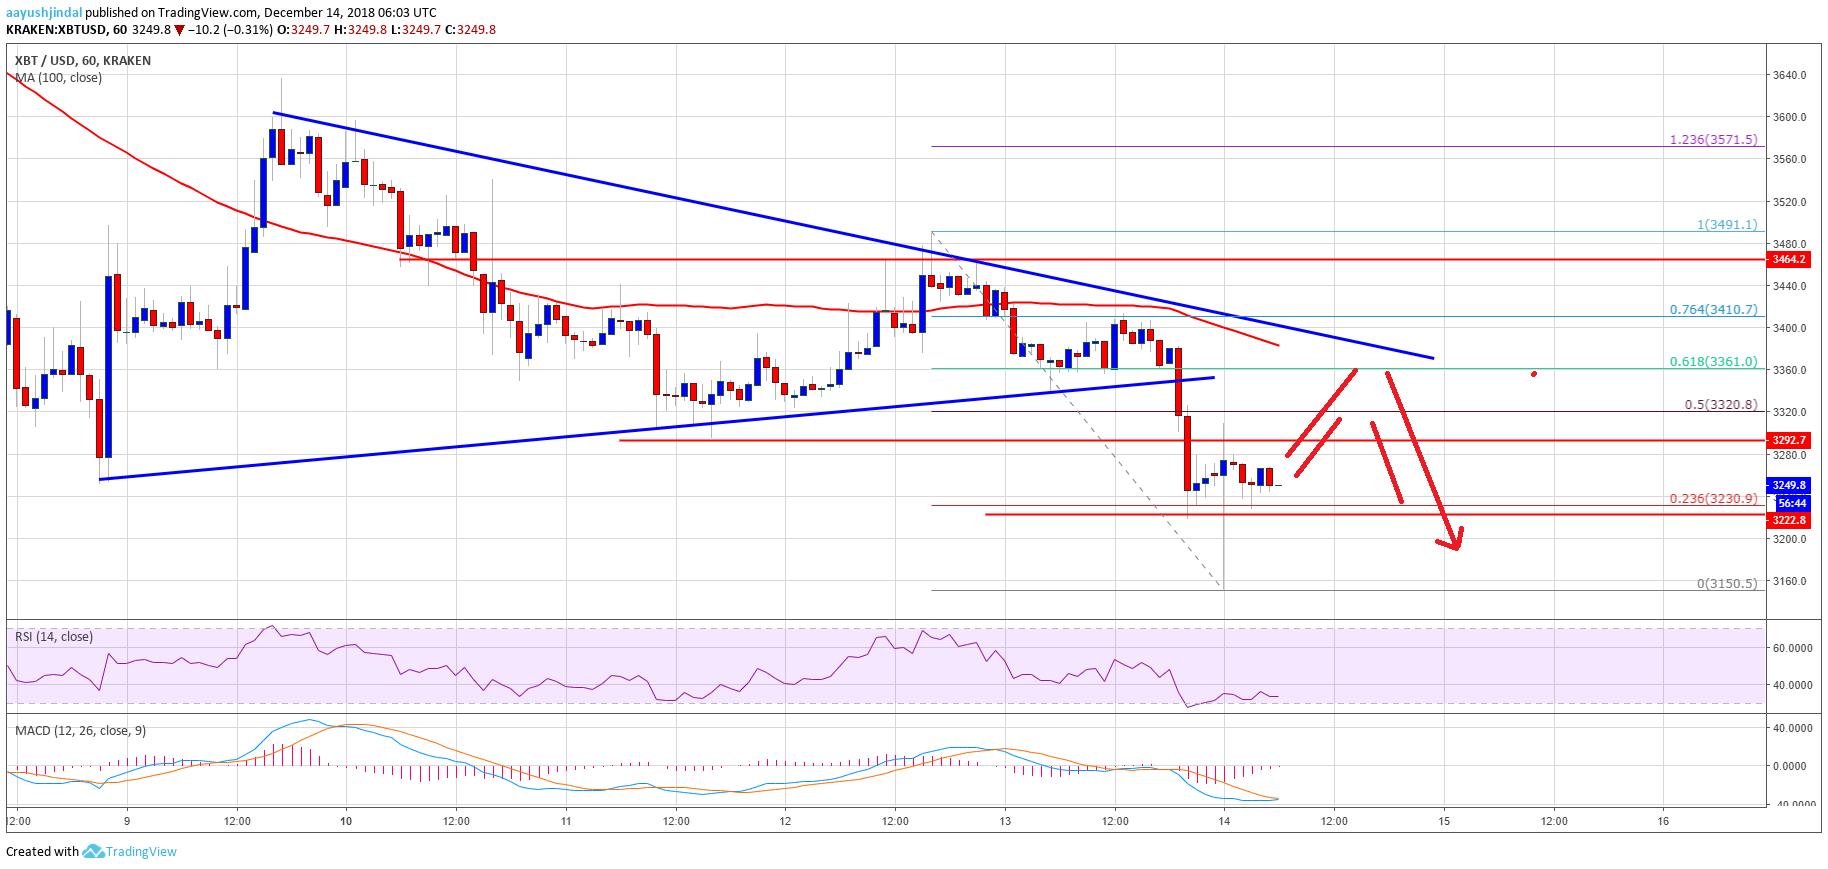 Bitcoin Price Watch: BTC Sellers Target Breakdown Below $3,000